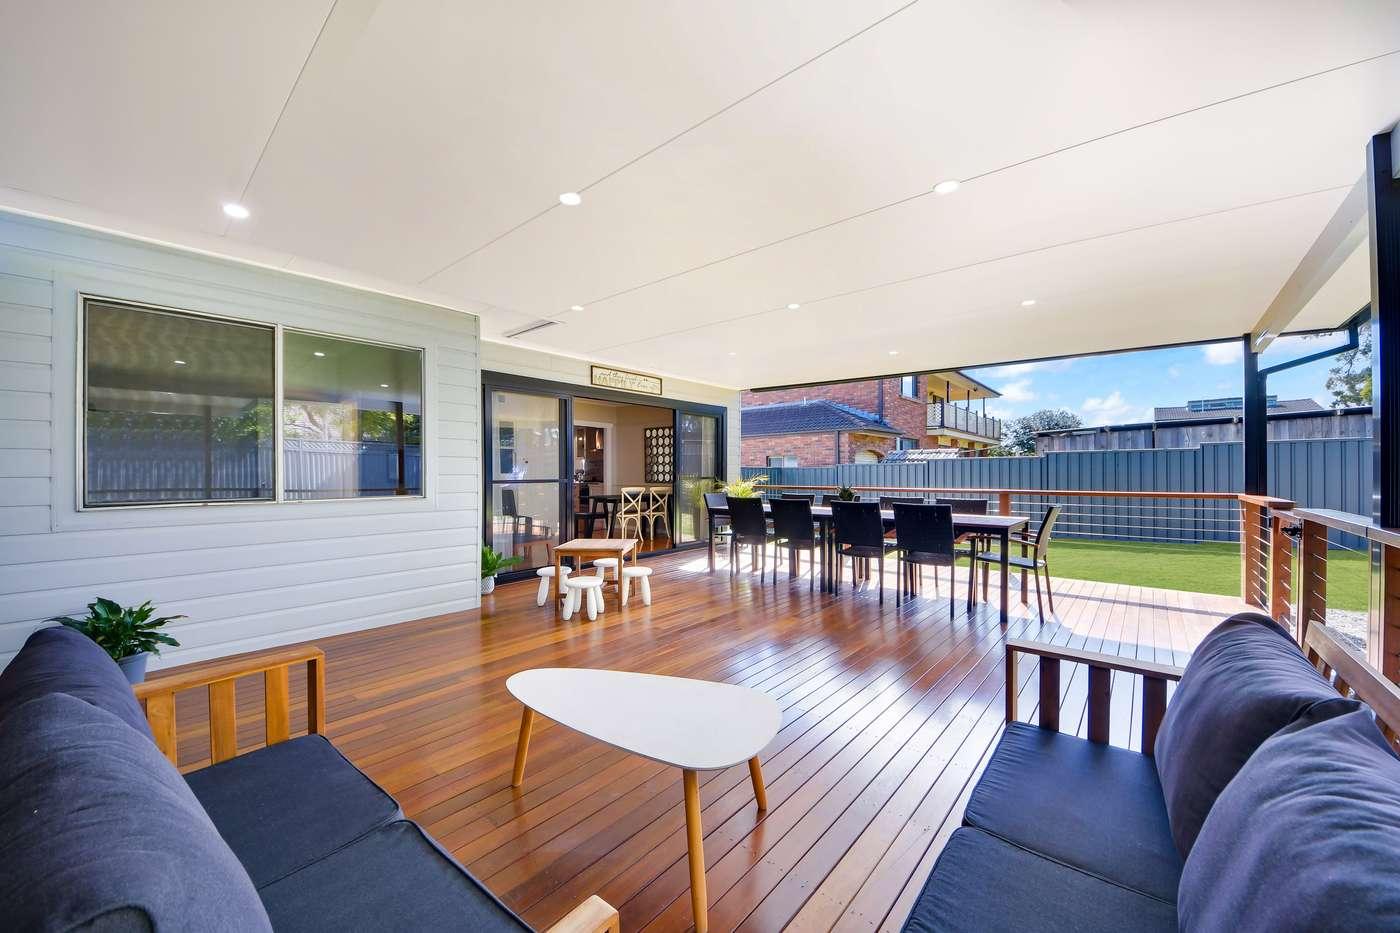 Main view of Homely house listing, 89 Carlisle Street, Ingleburn, NSW 2565